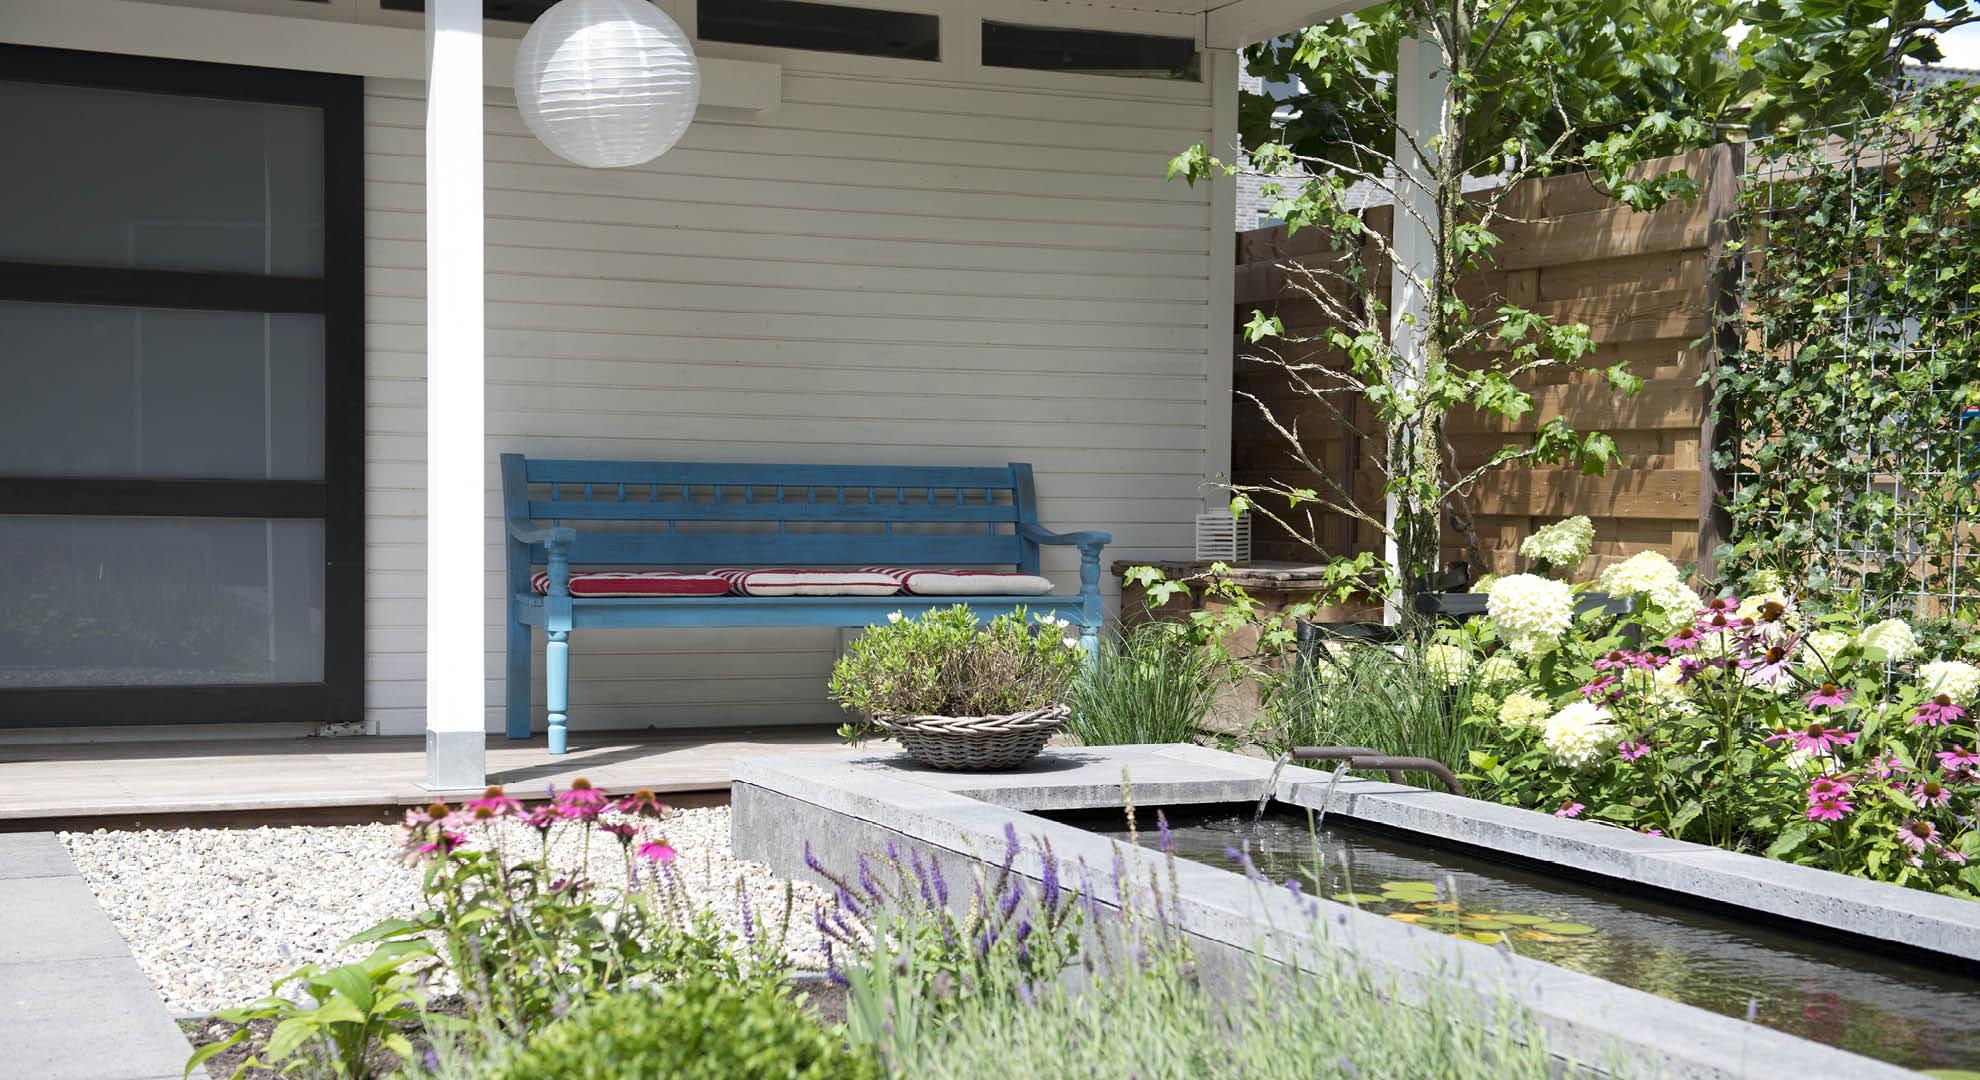 Moderne achtertuin bij nieuwbouwwoning - Foto 5